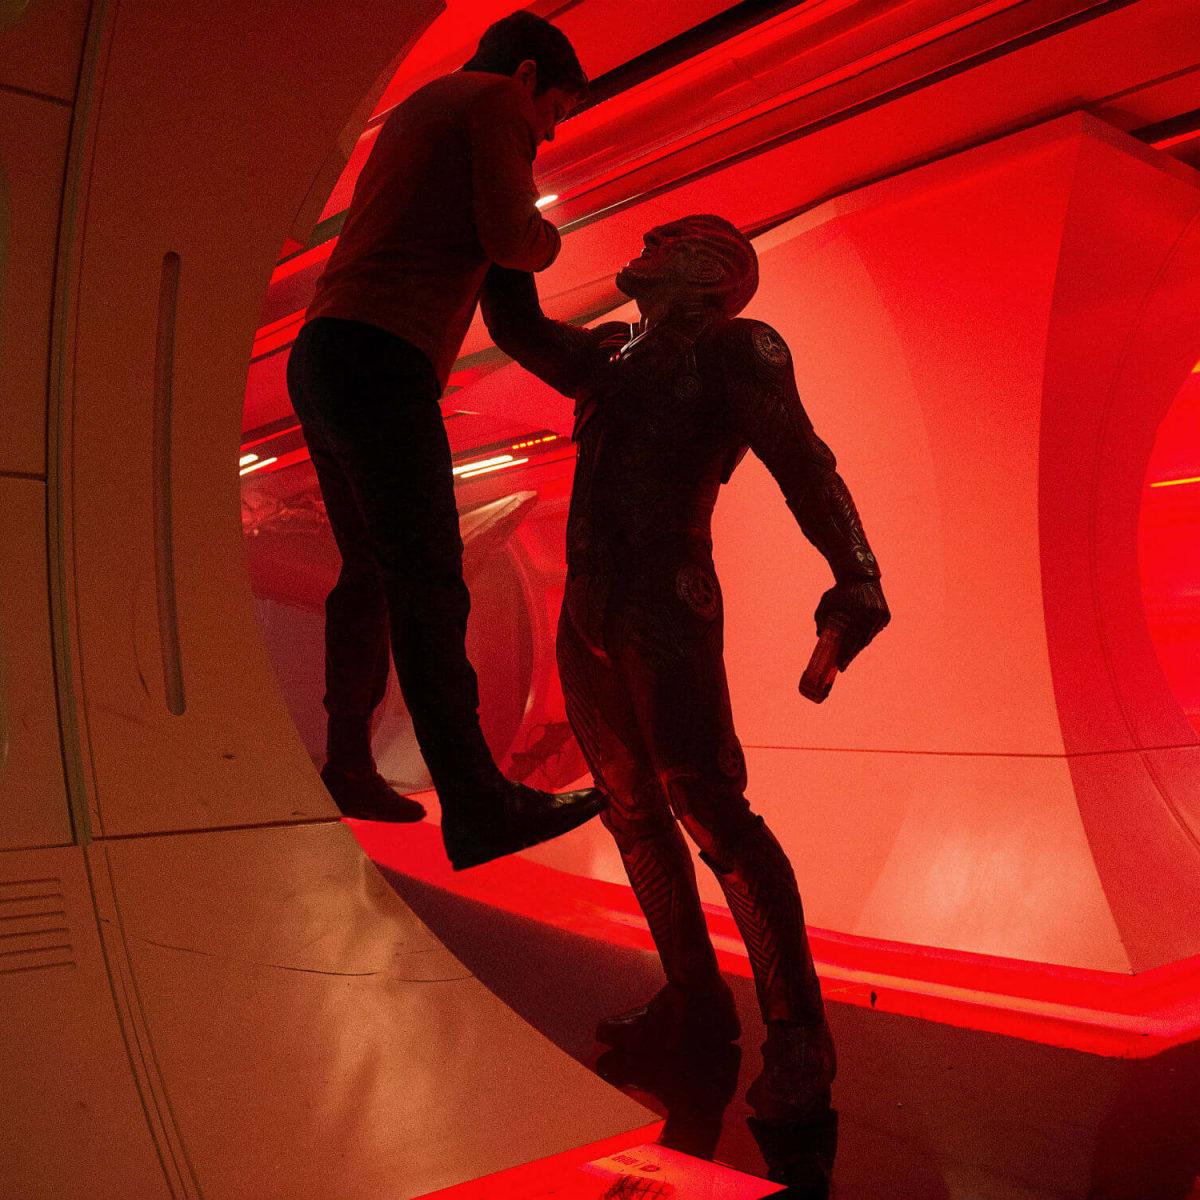 Chris Pine and Idris Elba in Star Trek Beyond